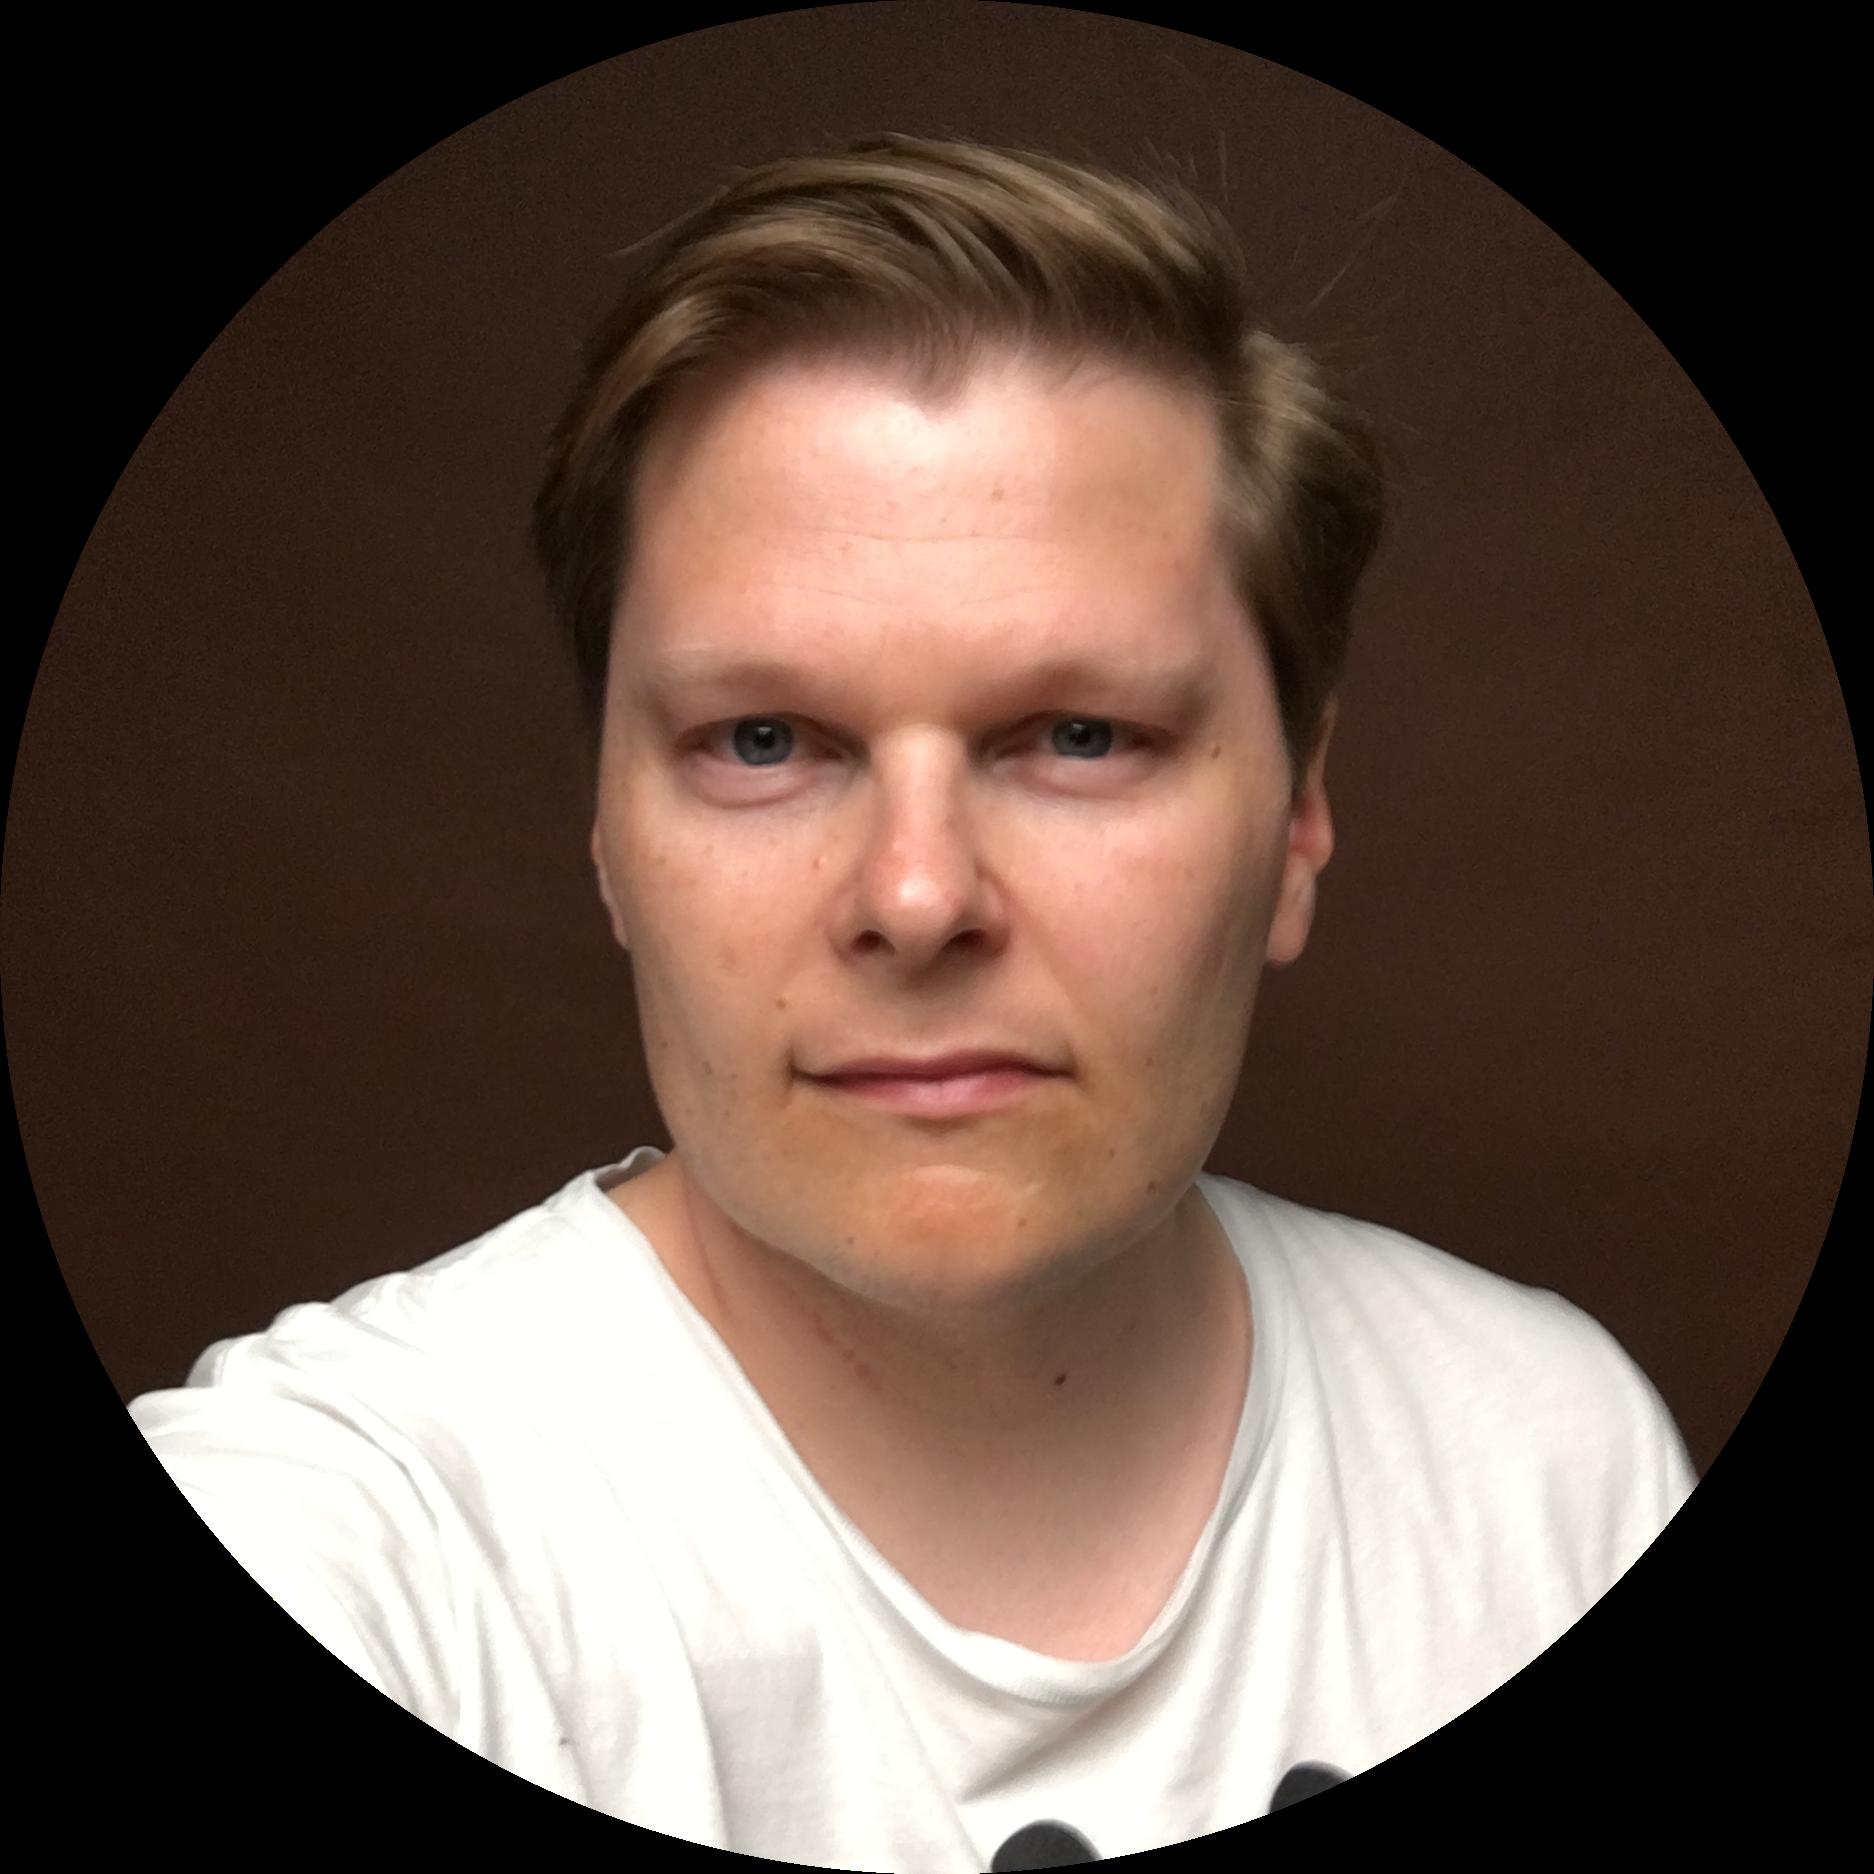 Videographer, photographer, Turku, Finland